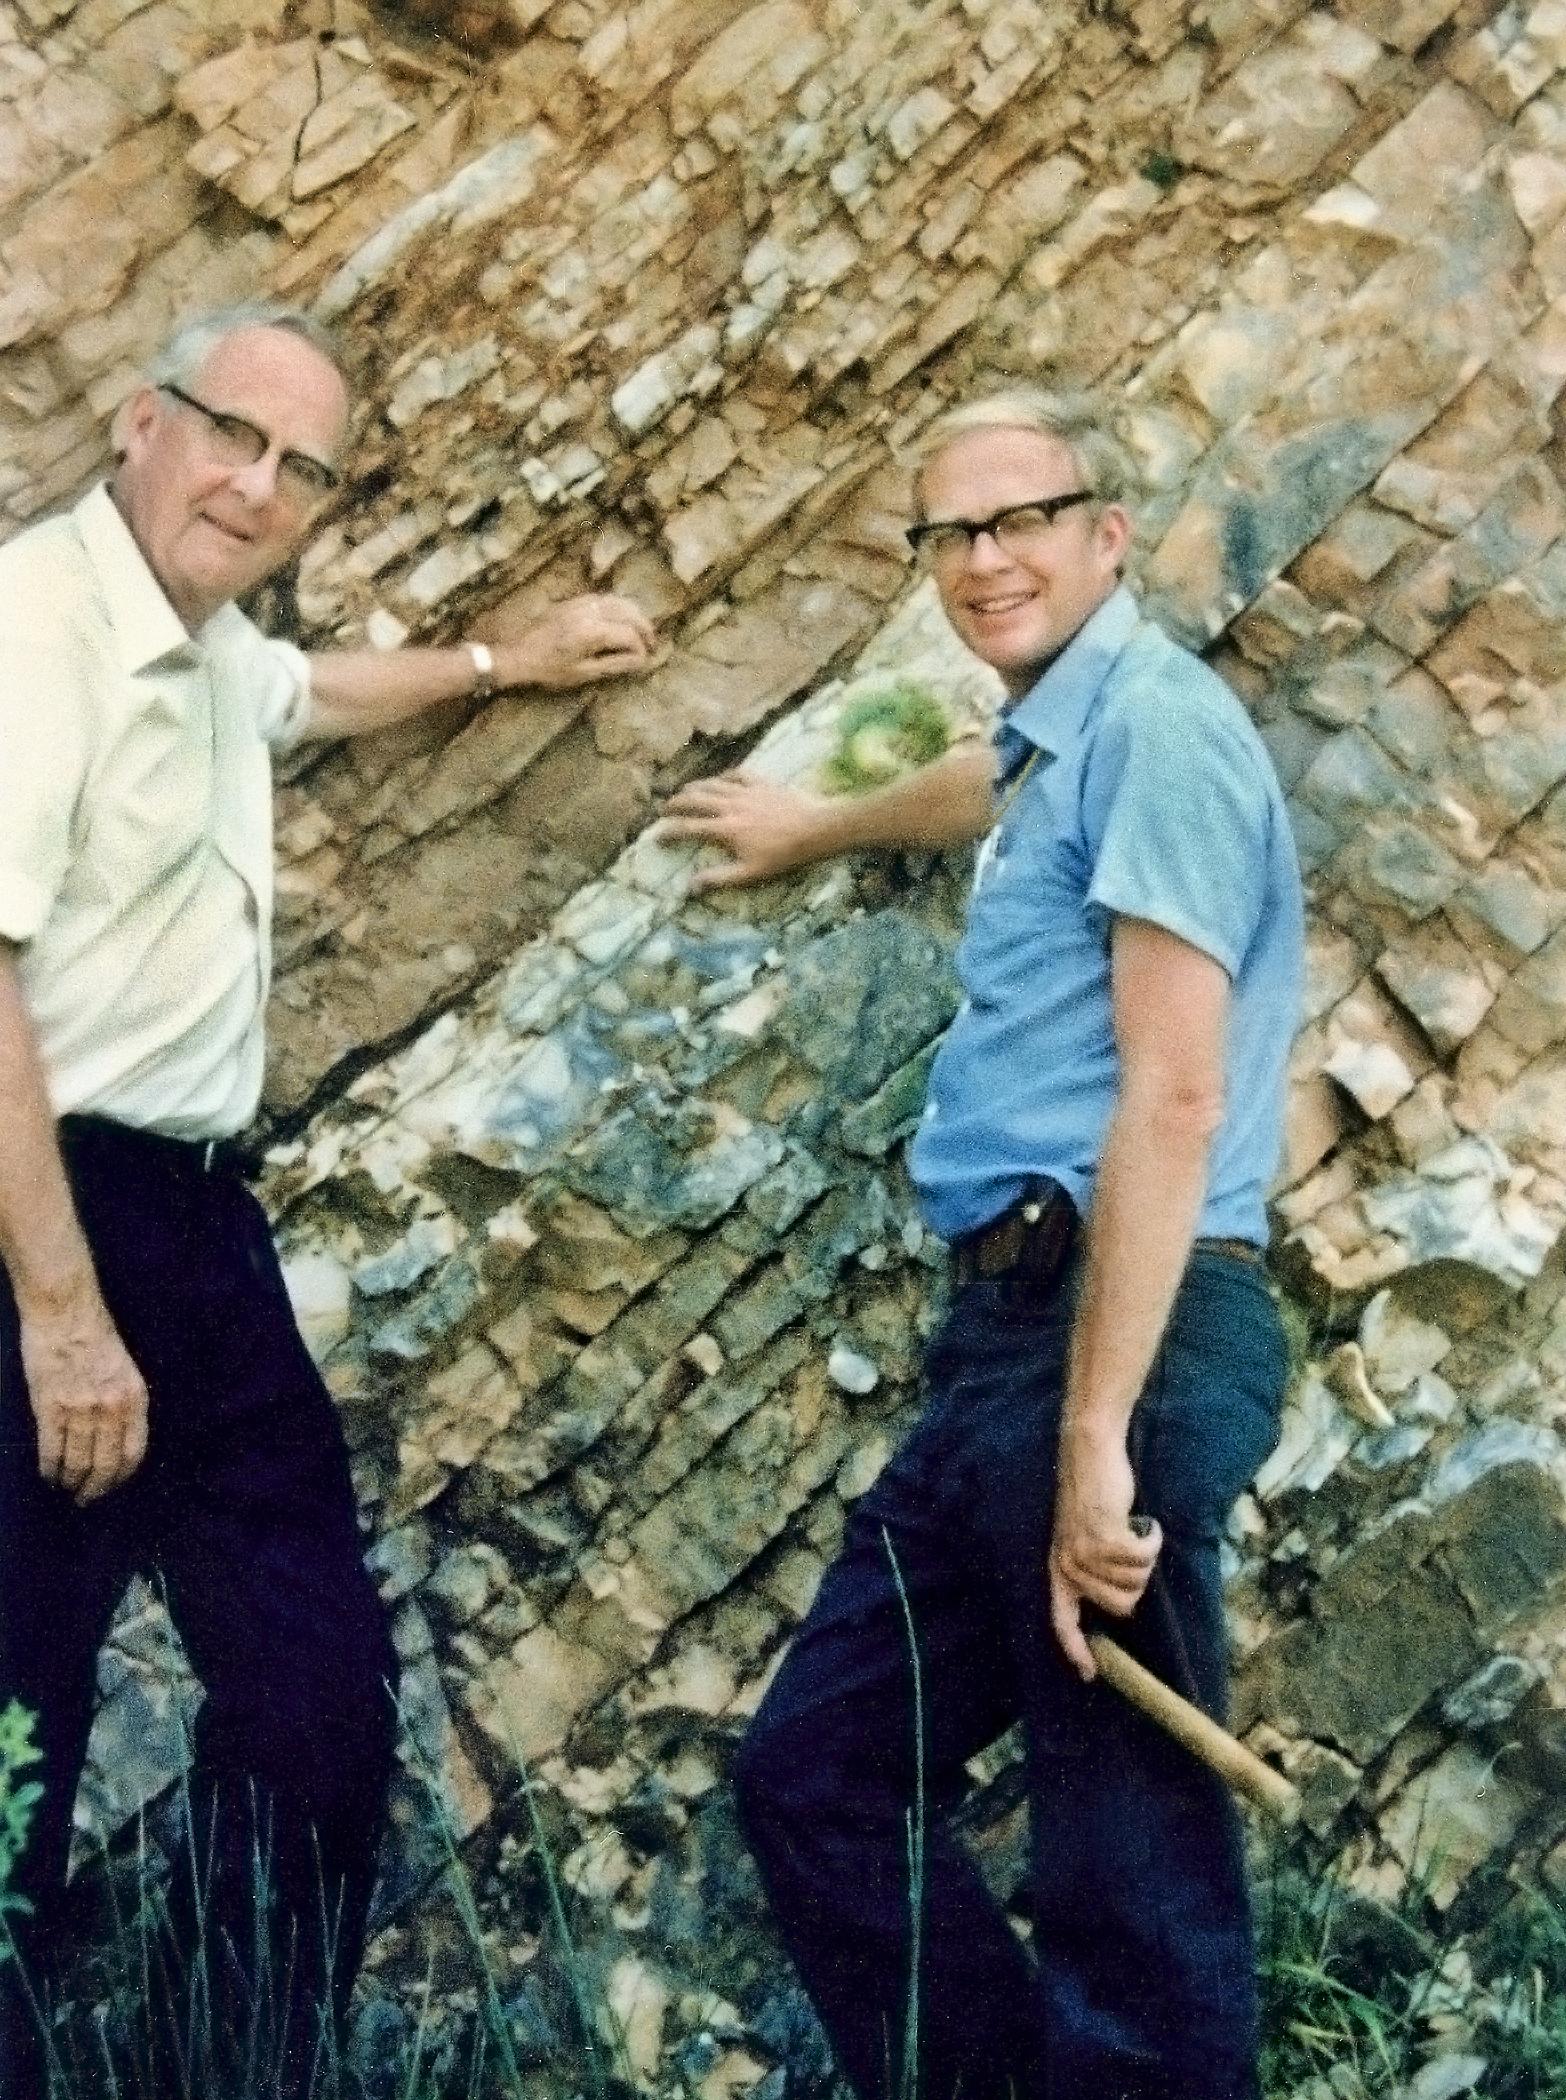 Physicist Luis Alvarez and his son, geologist Walter Alvarez, pose next to the Cretaceous-Tertiary boundary at Gubbio, Italy .  Lawrence Berkeley Laboratory/Wikimedia Commons  (public domain)